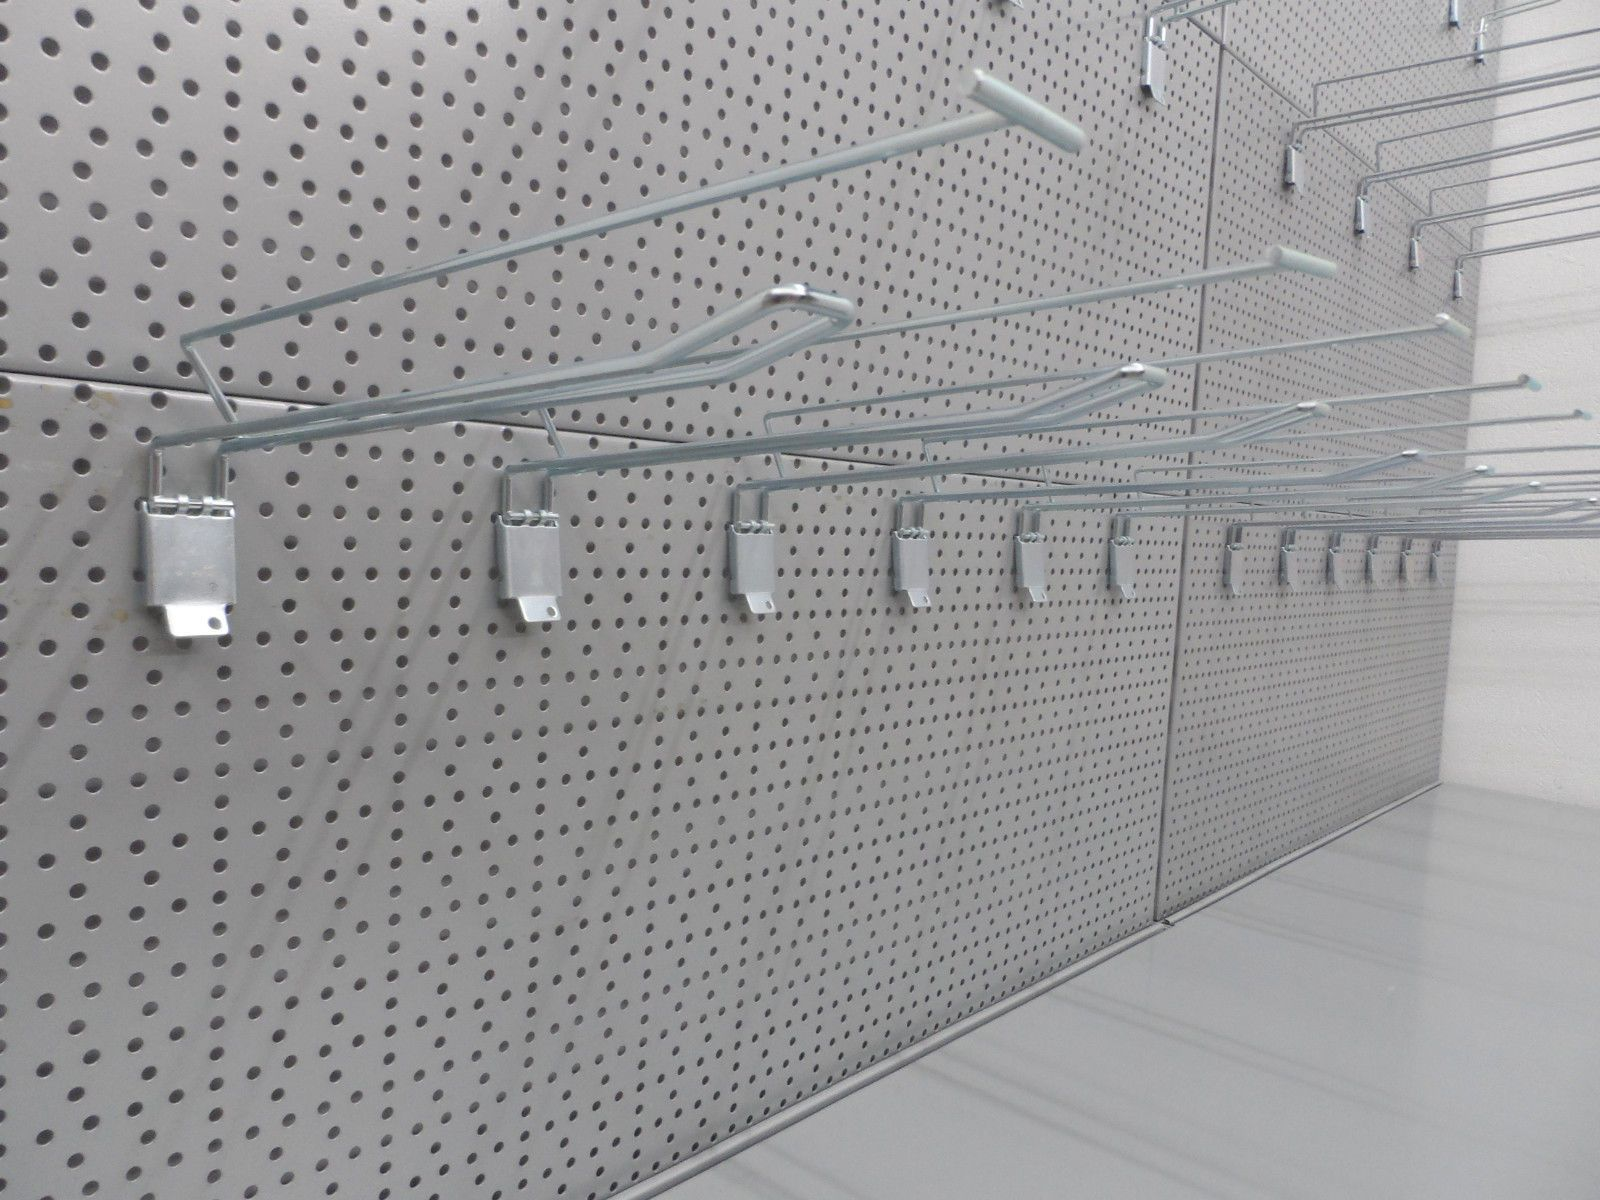 3m tegometall lochwand verkaufsregale weiss grau silber lochw nde regal haken 3 lochblech. Black Bedroom Furniture Sets. Home Design Ideas